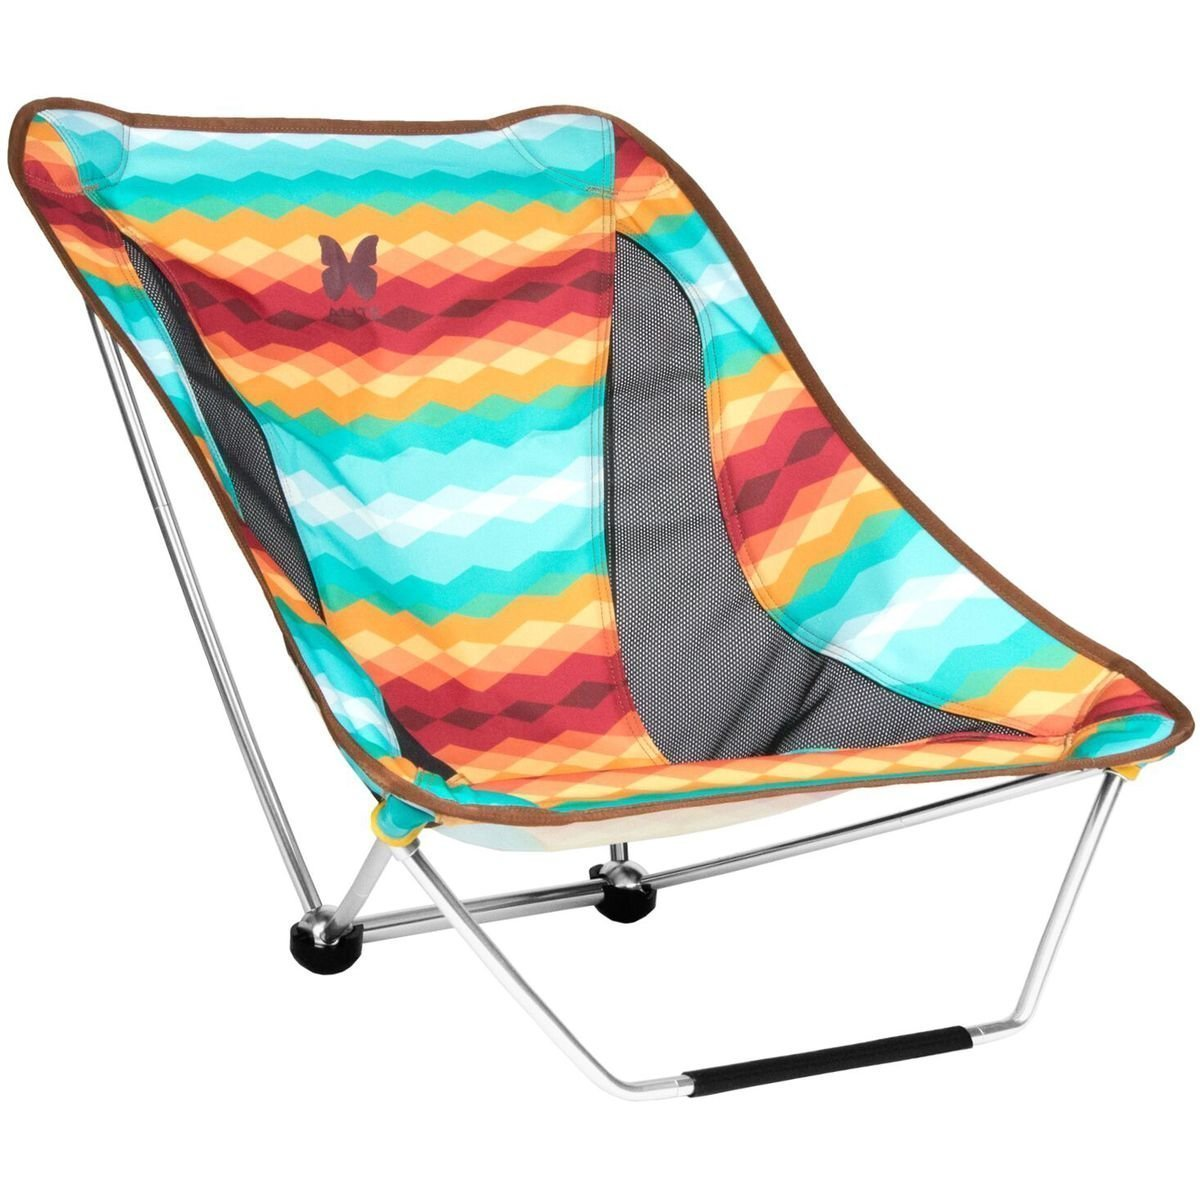 alite(エーライト) Mayfly Chair メイフライチェア (並行輸入品) B07B9R4FFS サウスウエスト サウスウエスト